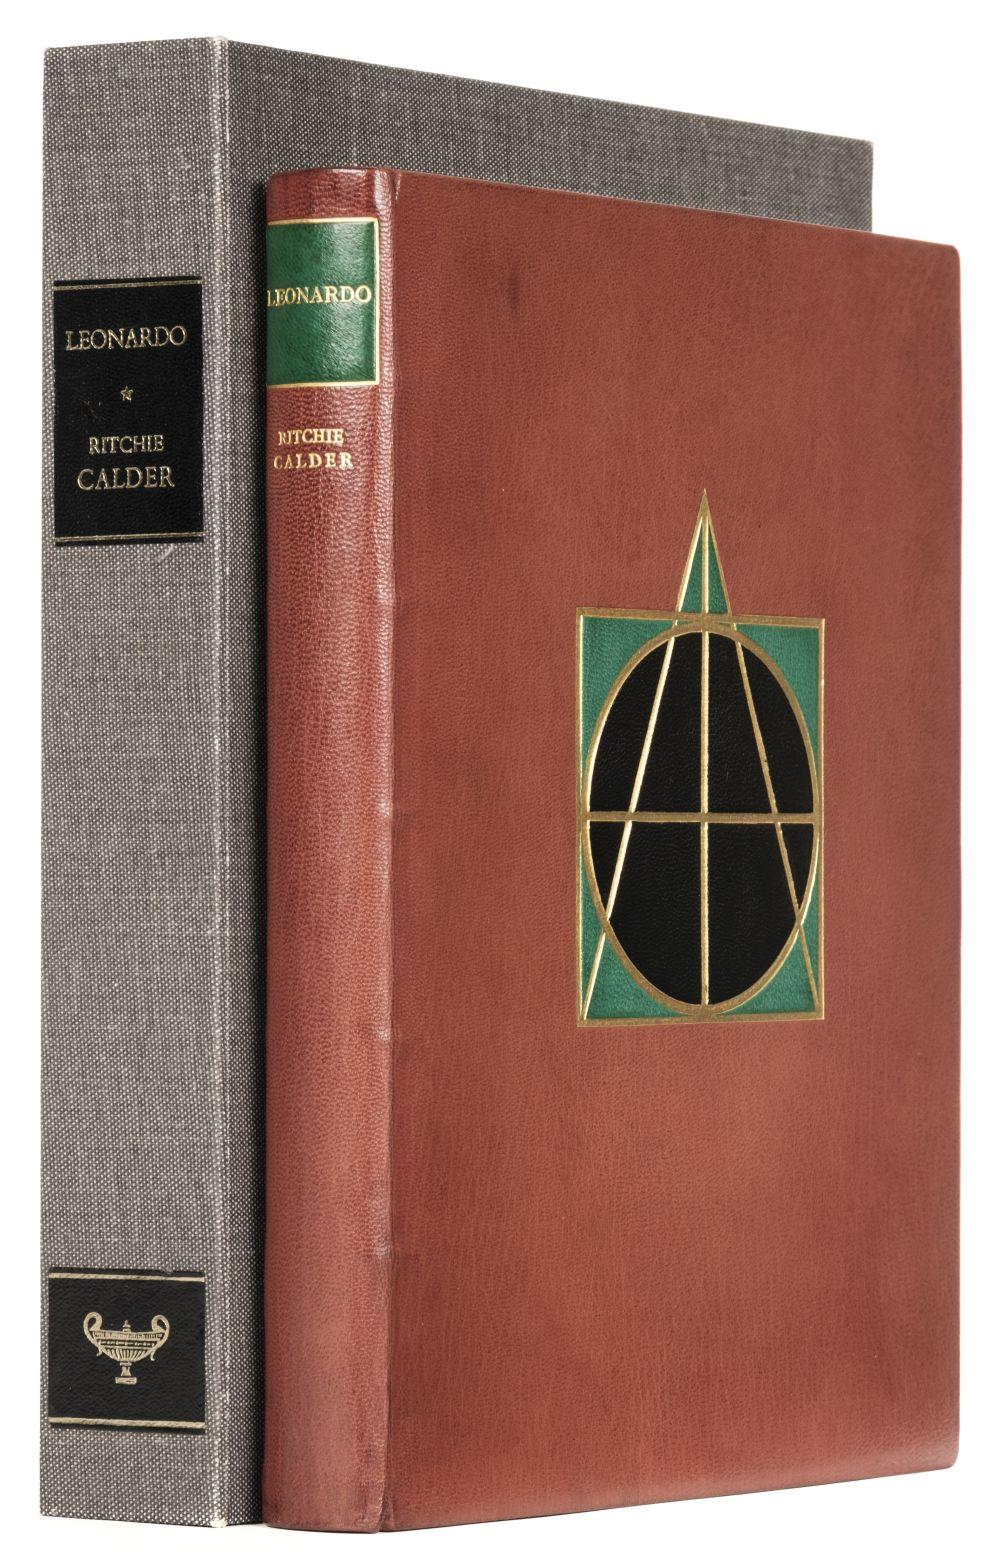 Arcadia Press. Leonardo, by Ritchie Calder, 1971, signed limited edition